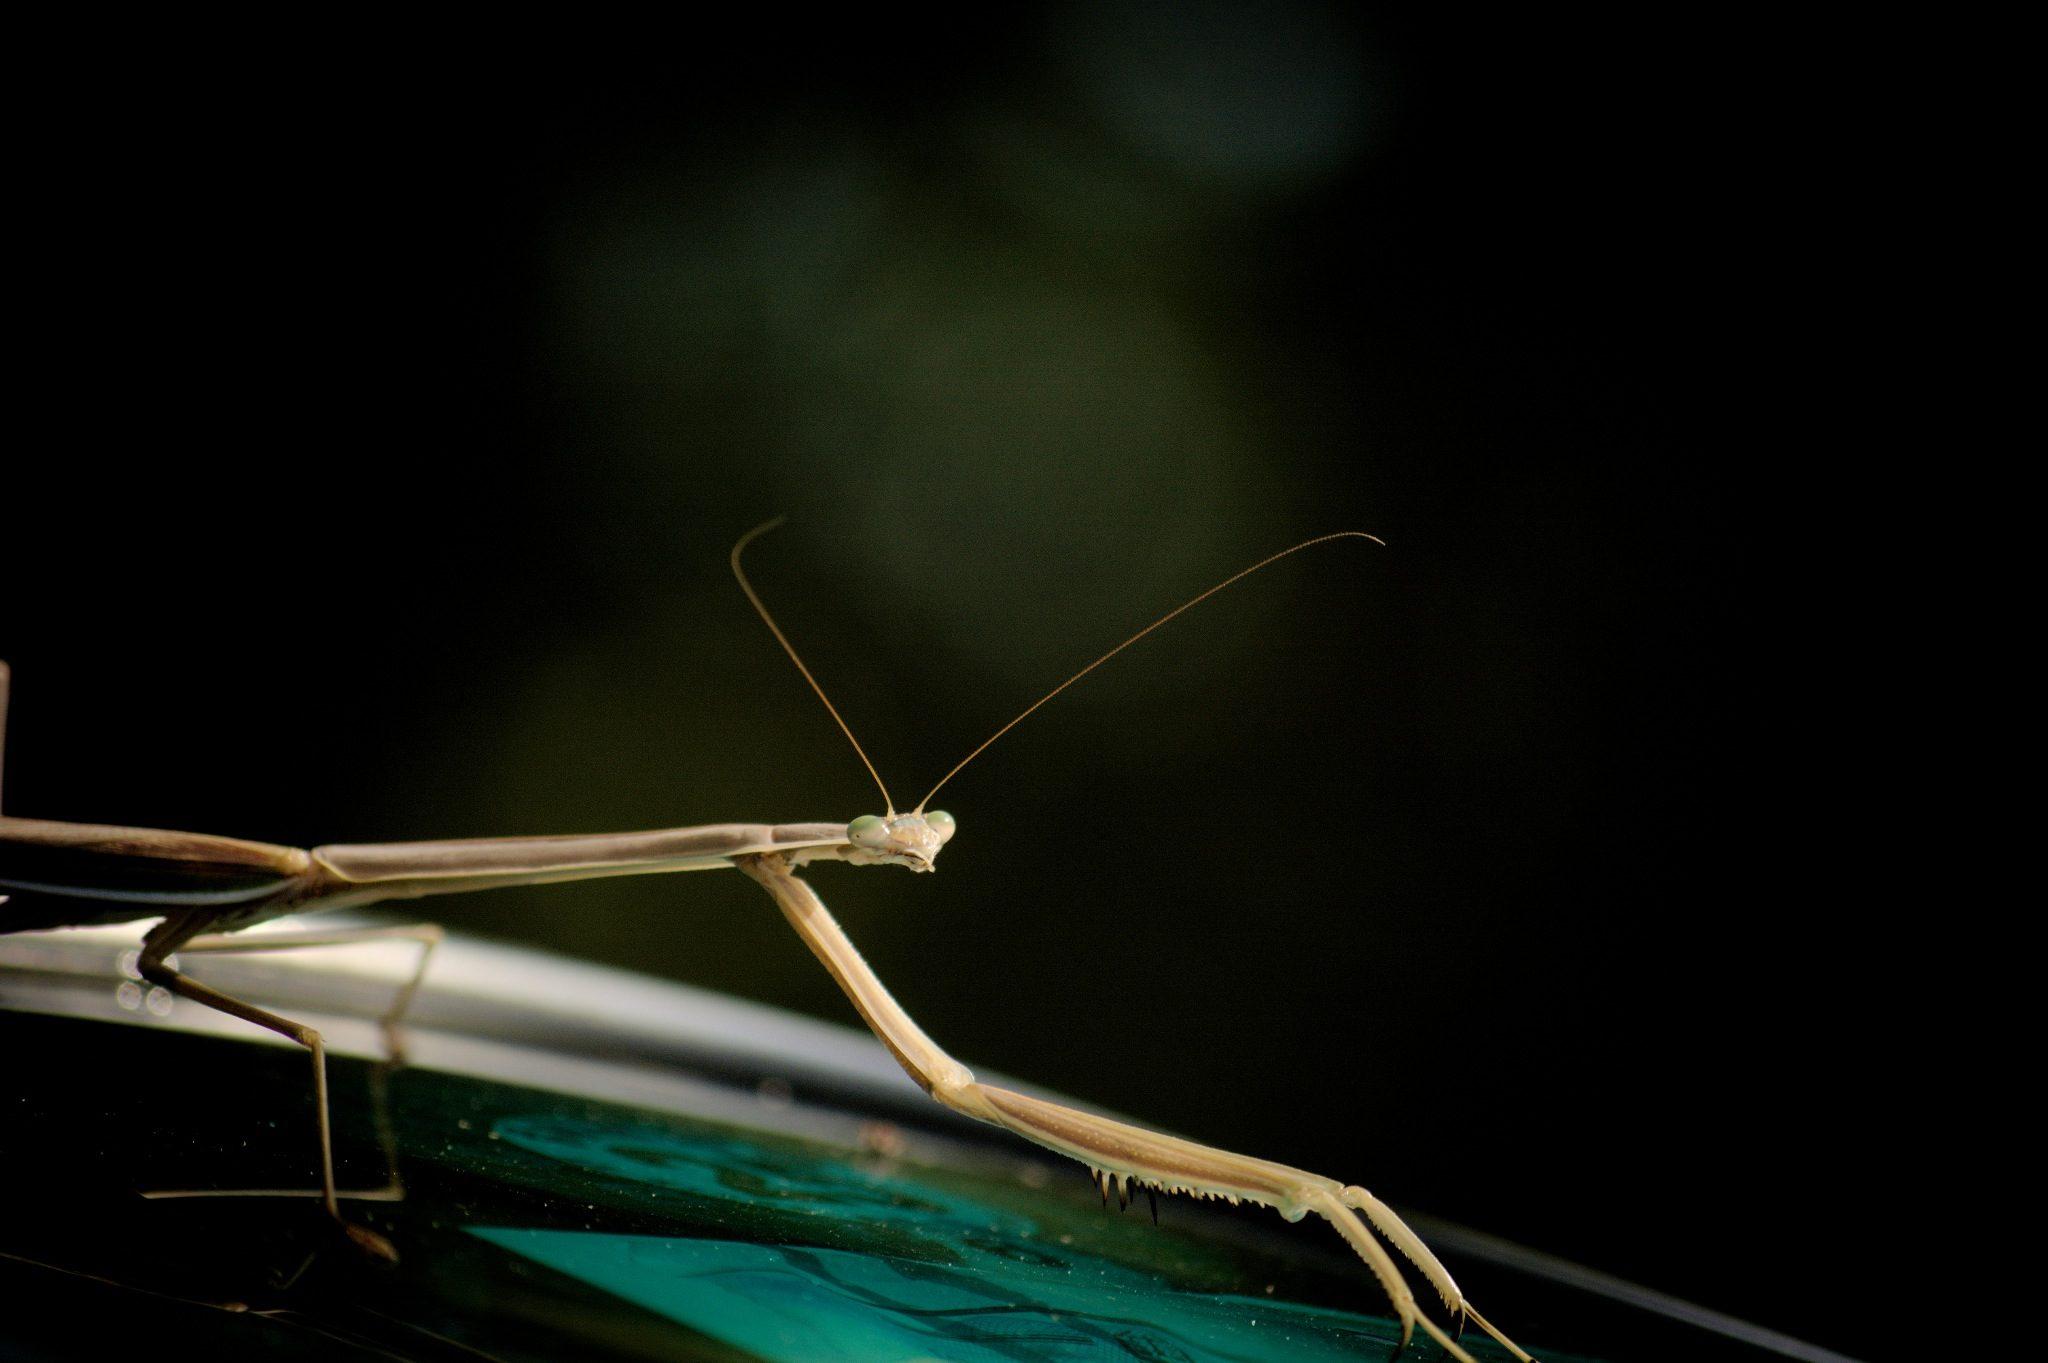 mantis, religiosa, insecto, bicho, antenas - Fondos de Pantalla HD - professor-falken.com